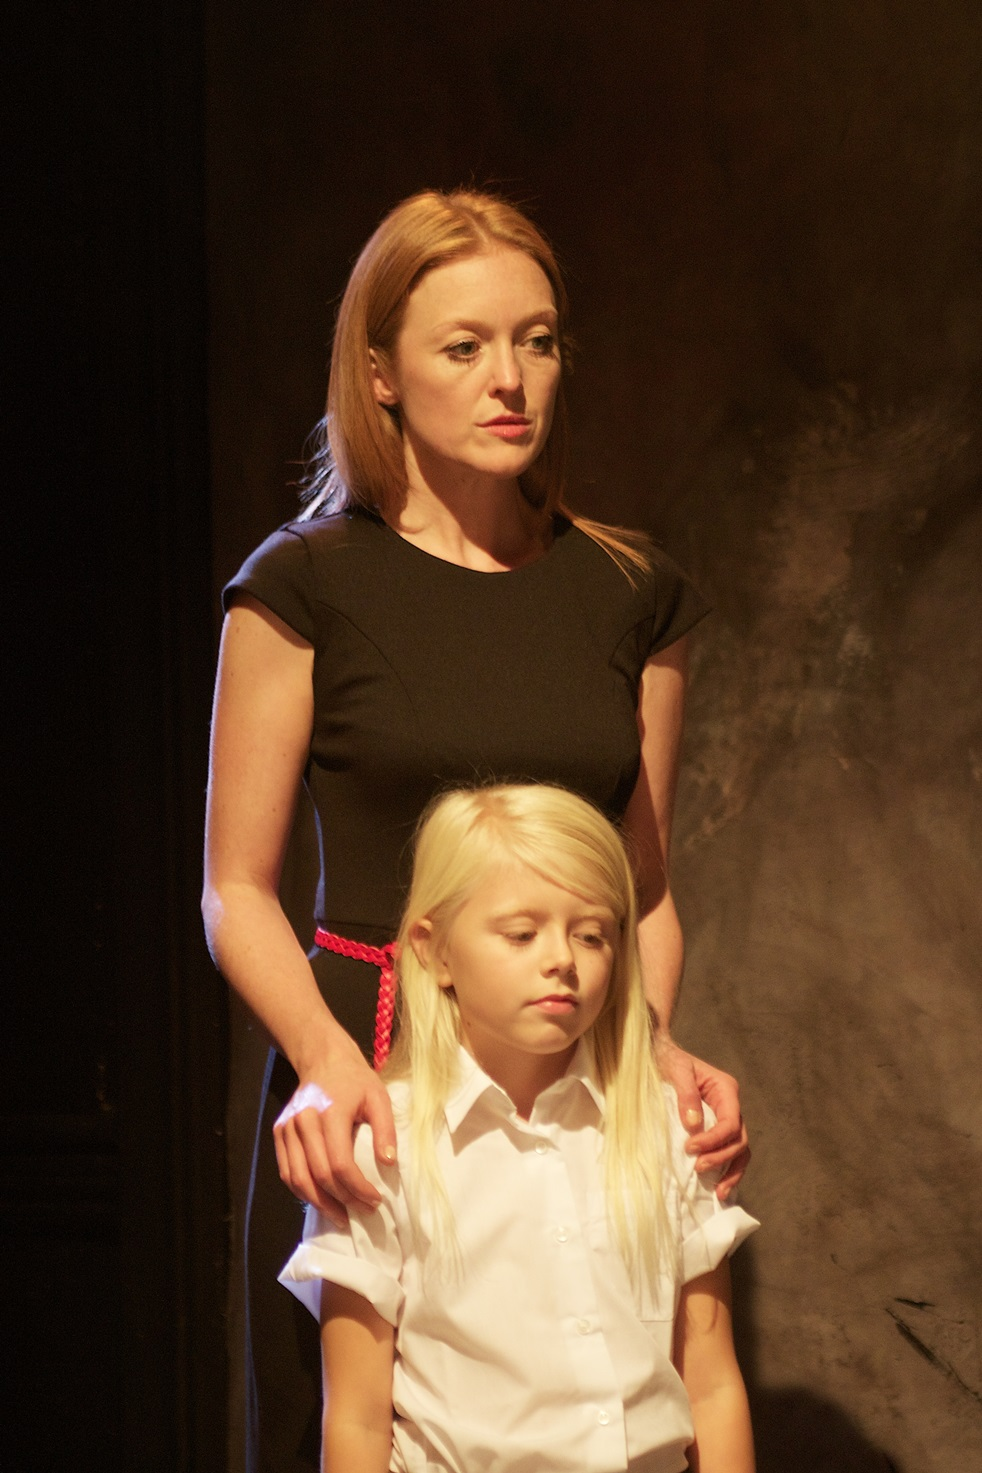 Actresses: Tilly Gaunt & Abigail Cole Jarvie Photograph:  stageshotslondon@gmail.com